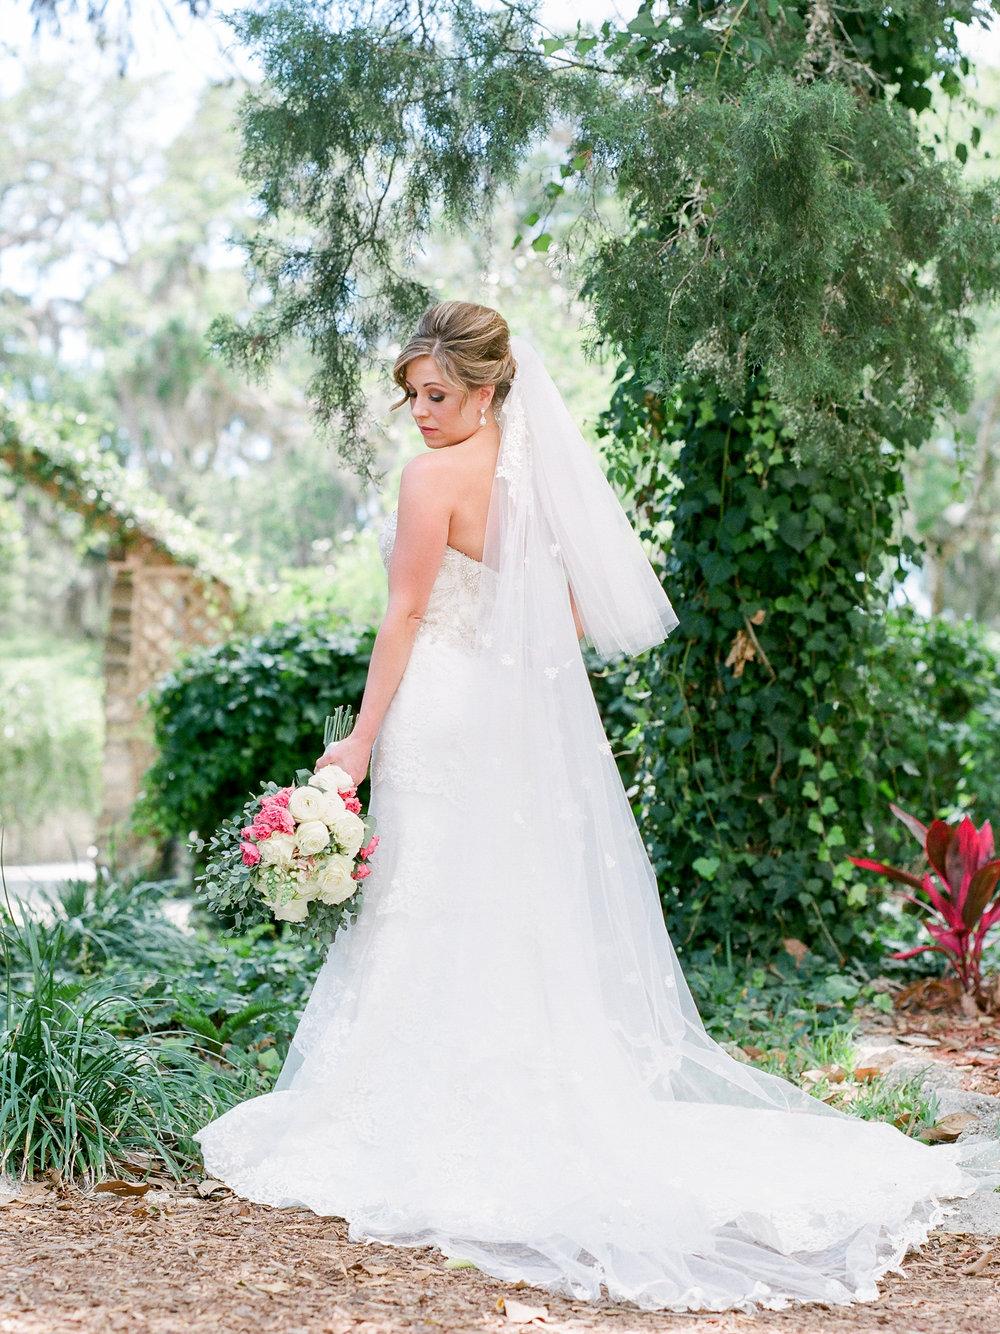 Lisa Silva Photography- Jacksonville, Florida Fine Art Film Wedding Photography (4 of 203).jpg